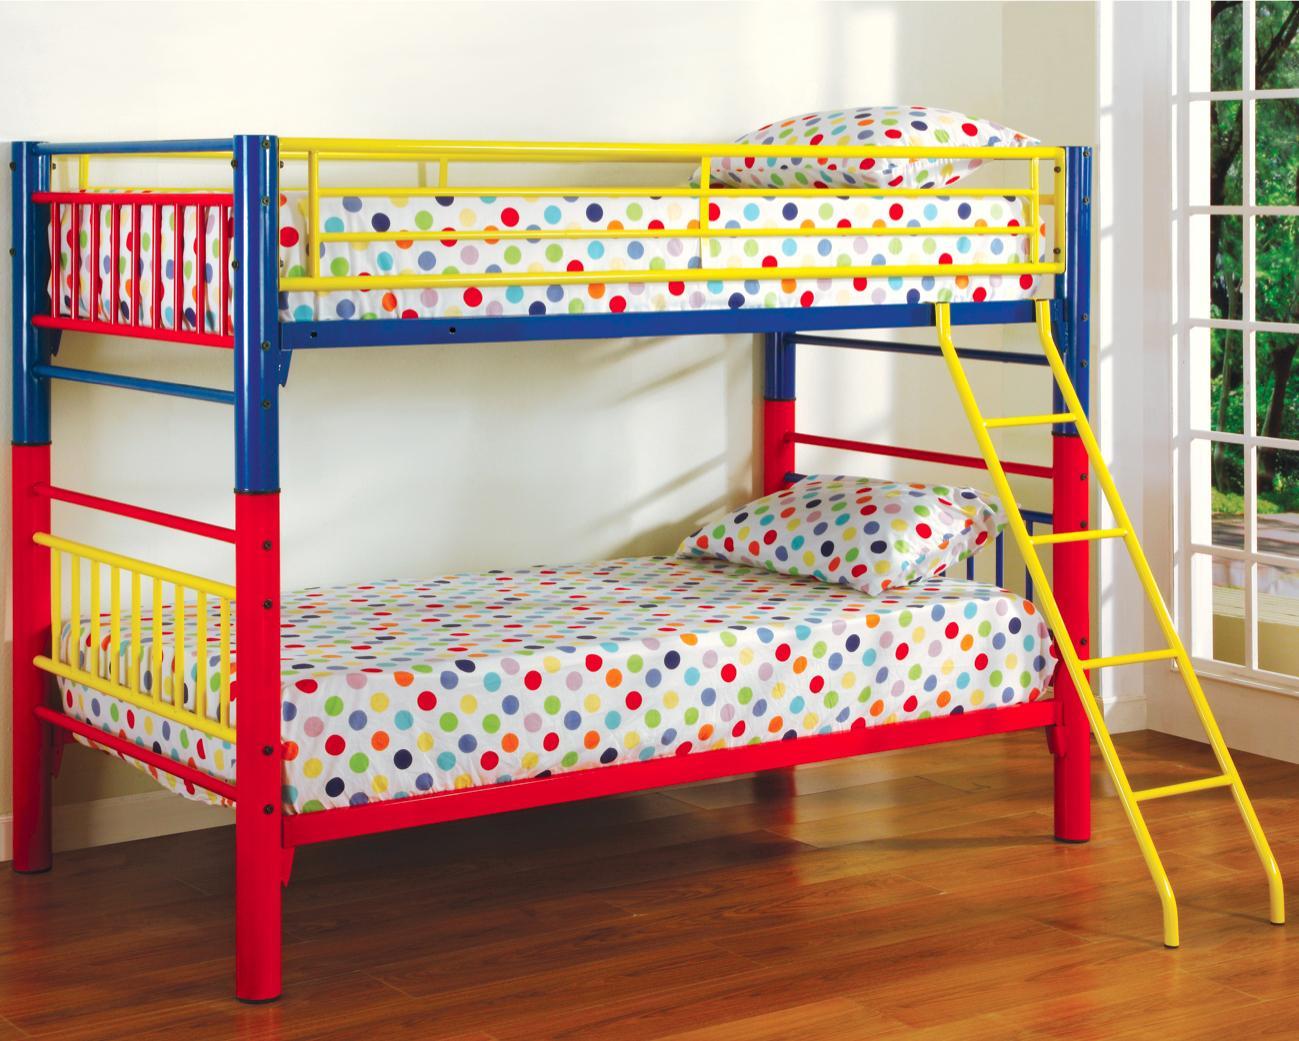 Coaster Furniture Oates Bunk Bed Broadway Furniture